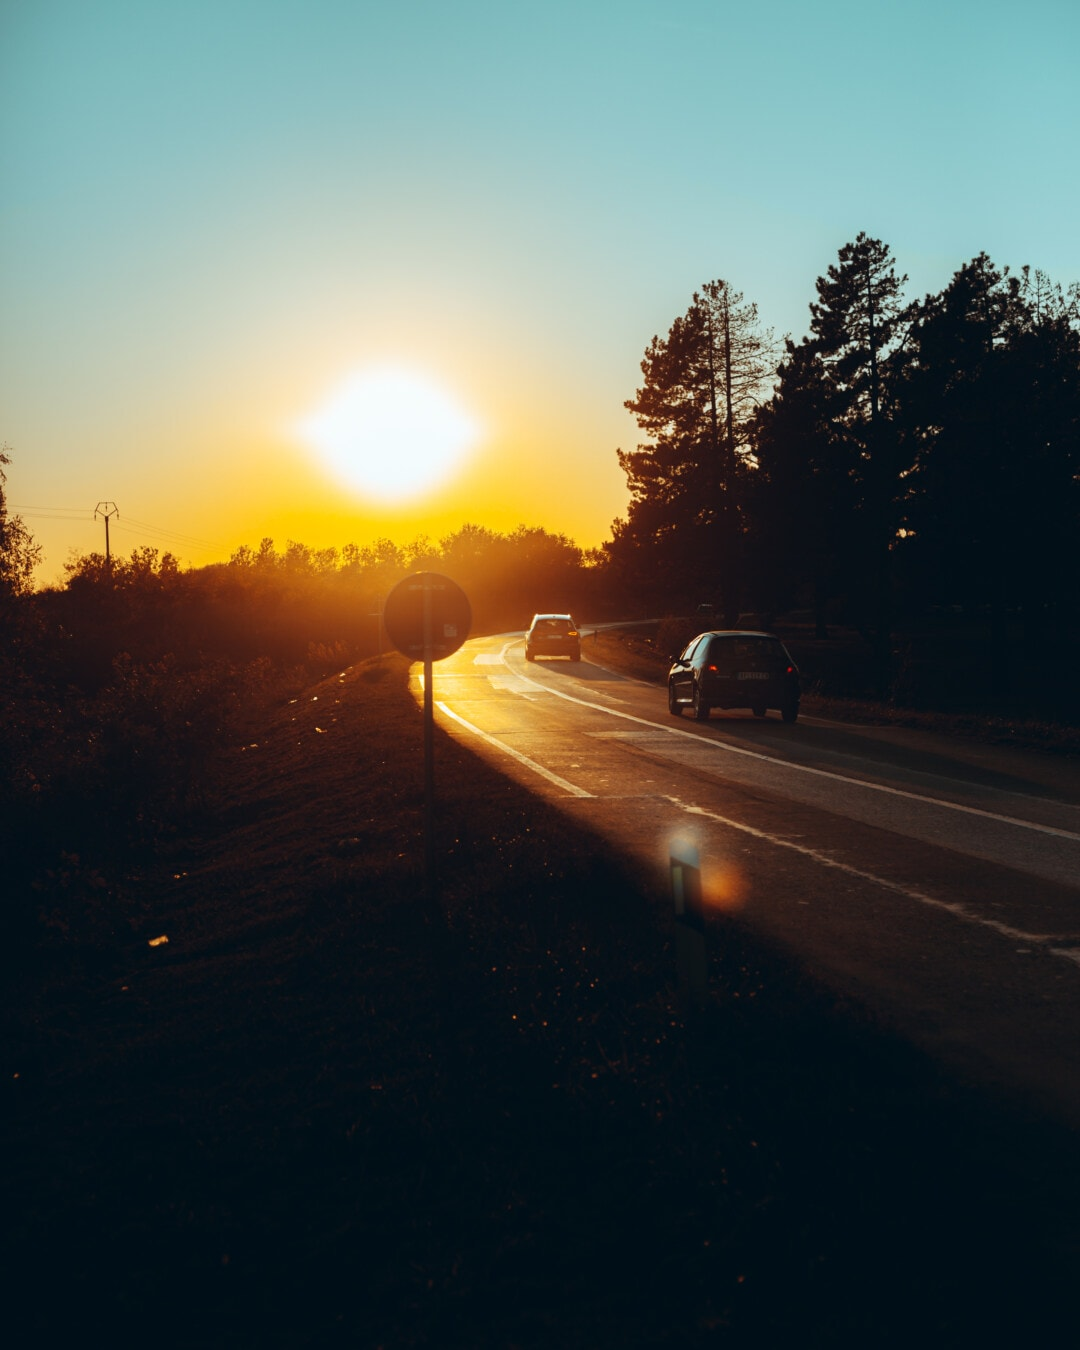 voitures, transport, coucher de soleil, voyage, voiture, Itinéraire, soleil, rue, trafic, autoroute